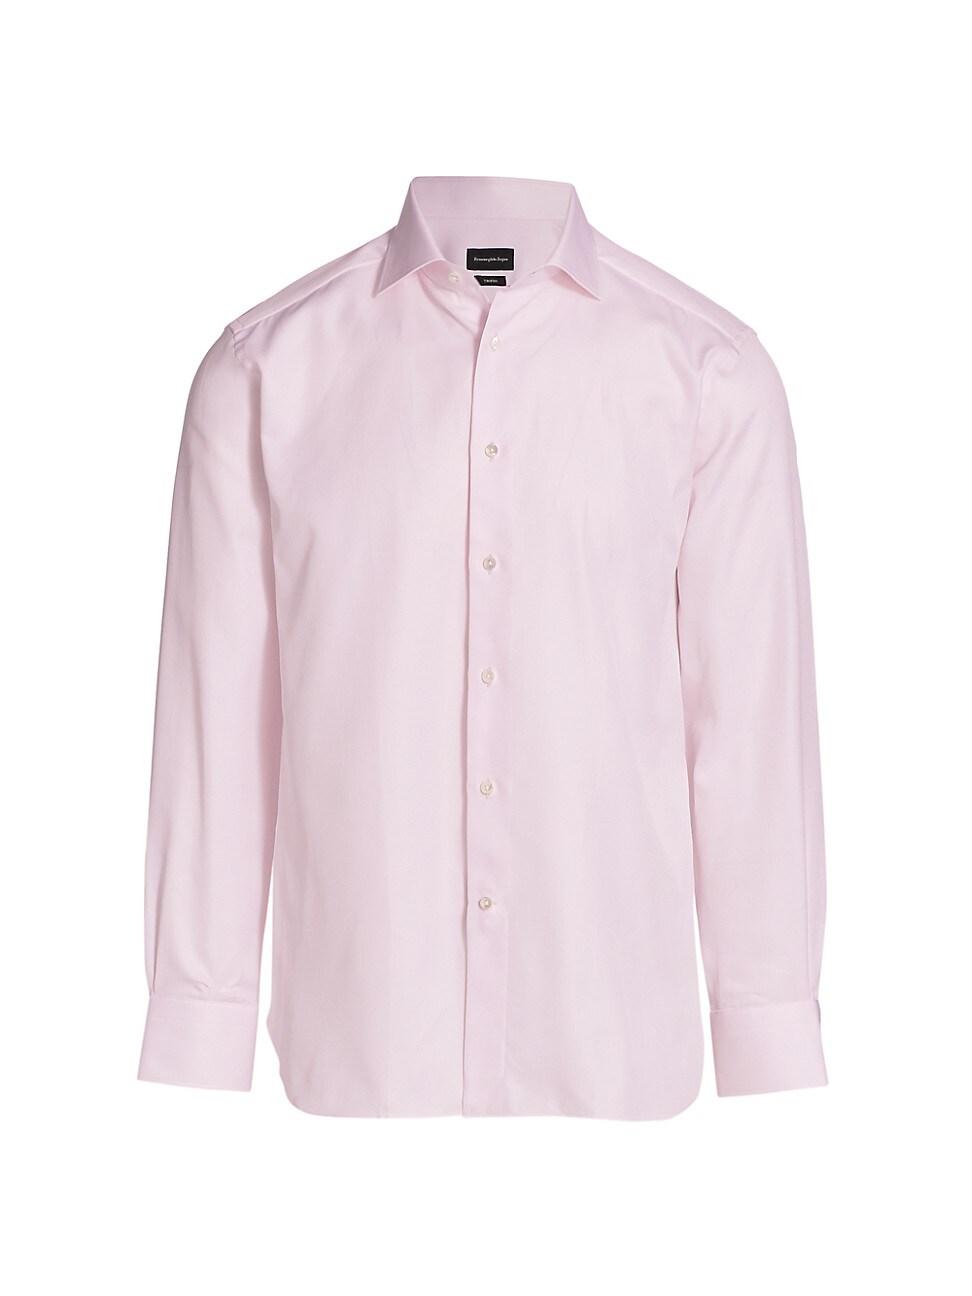 Ermenegildo Zegna Trofeo Textured Sport Shirt In Bright Pink Solid